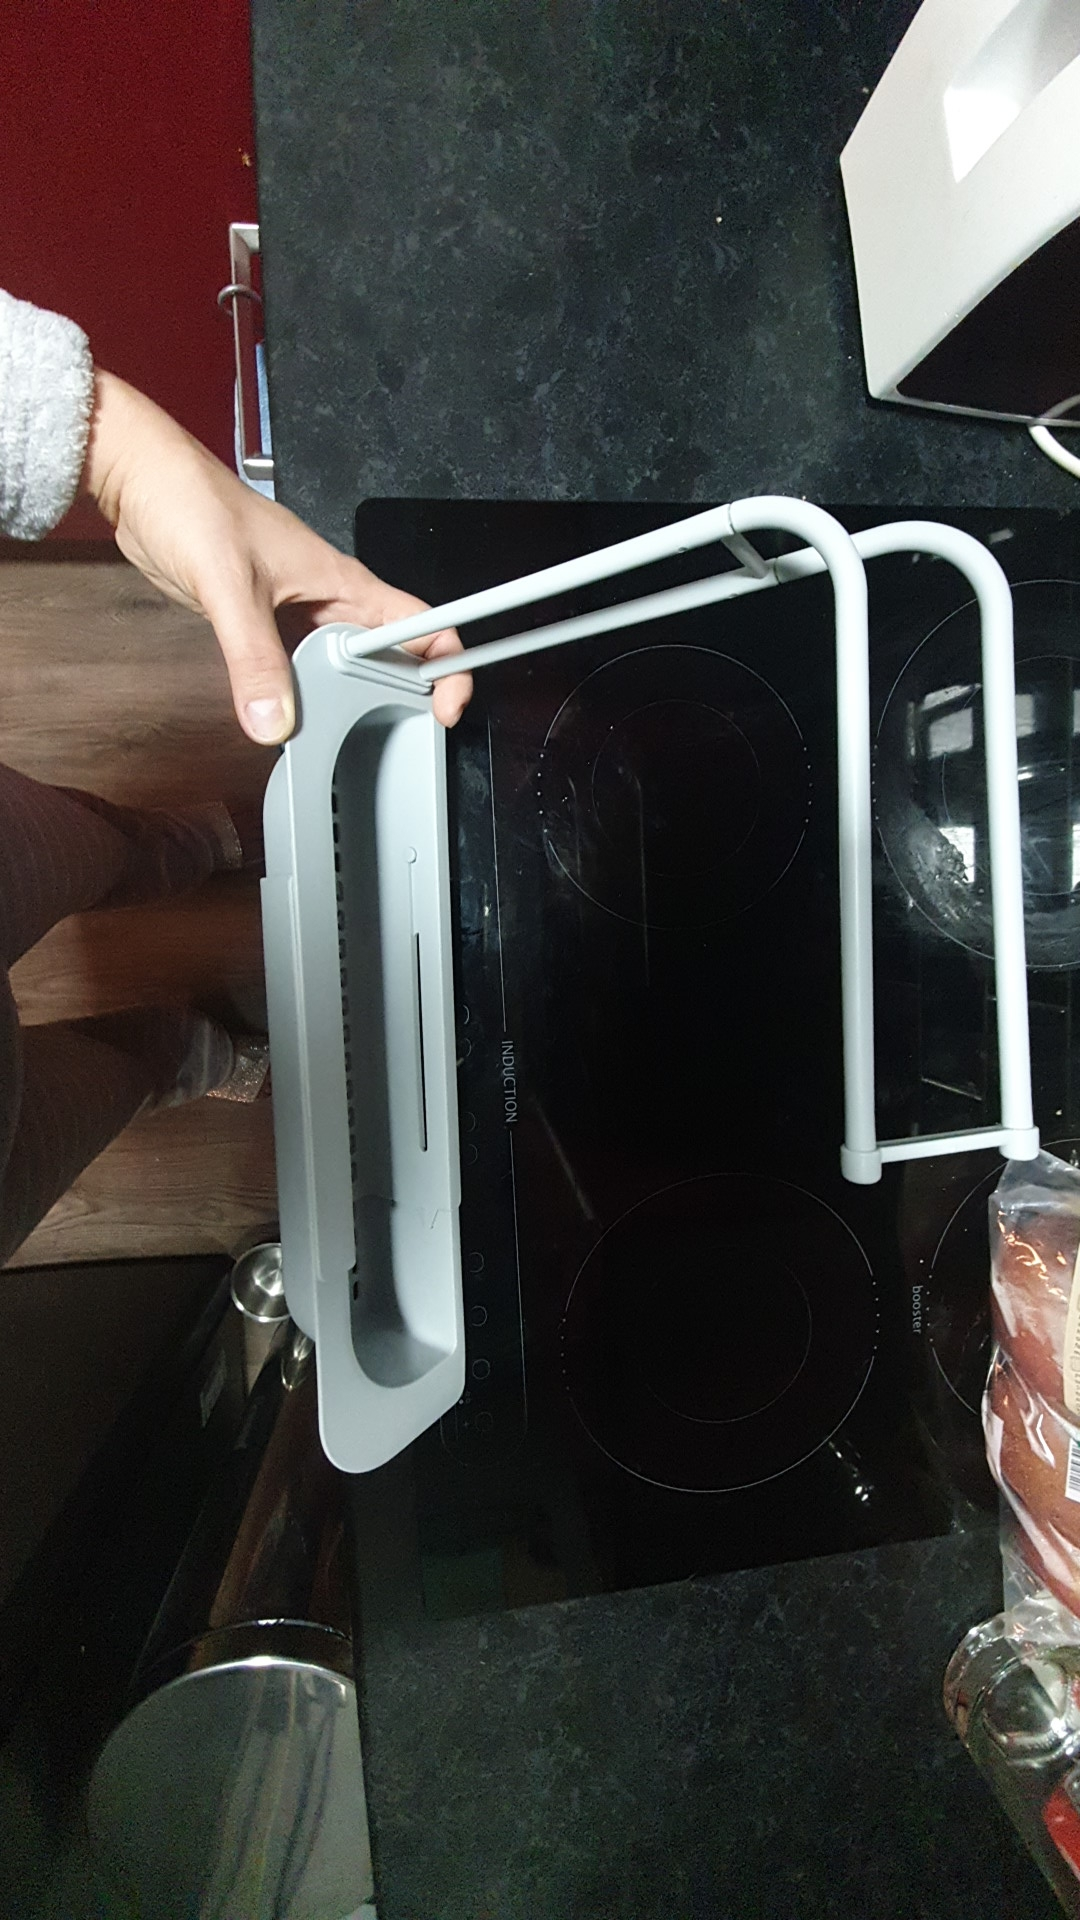 Telescopic Sink Storage Rack - muizow photo review